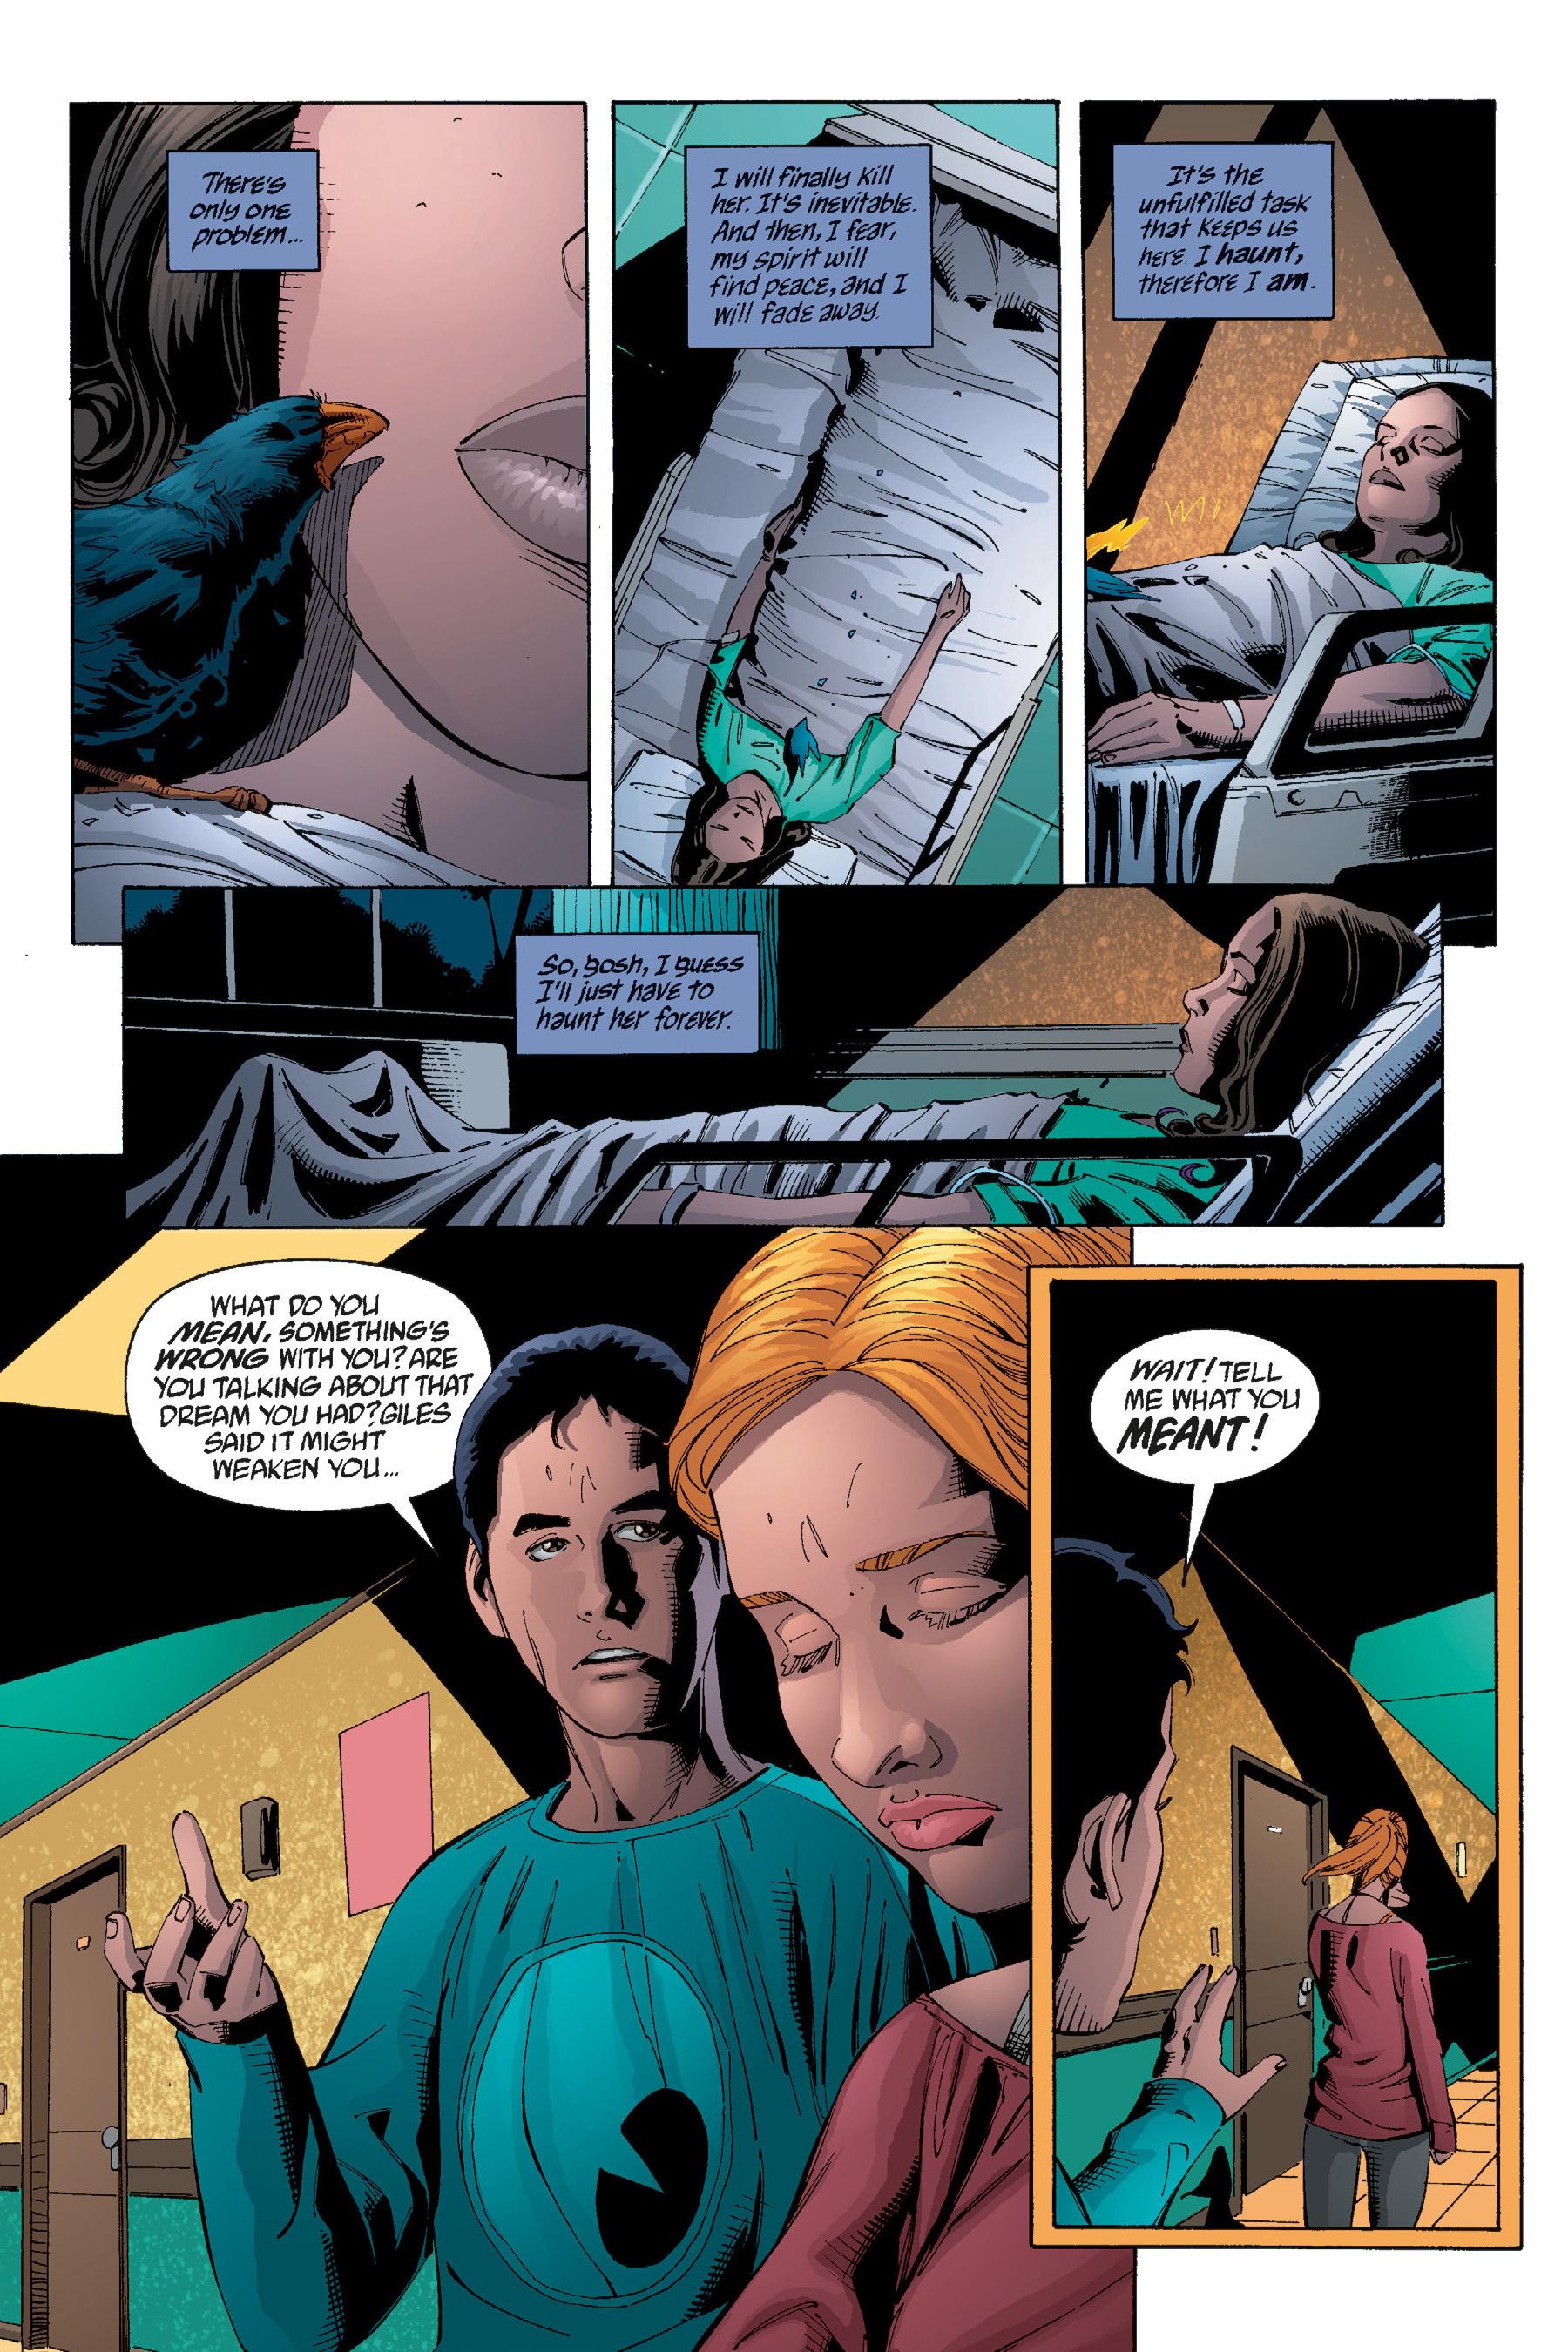 Read online Buffy the Vampire Slayer: Omnibus comic -  Issue # TPB 5 - 38